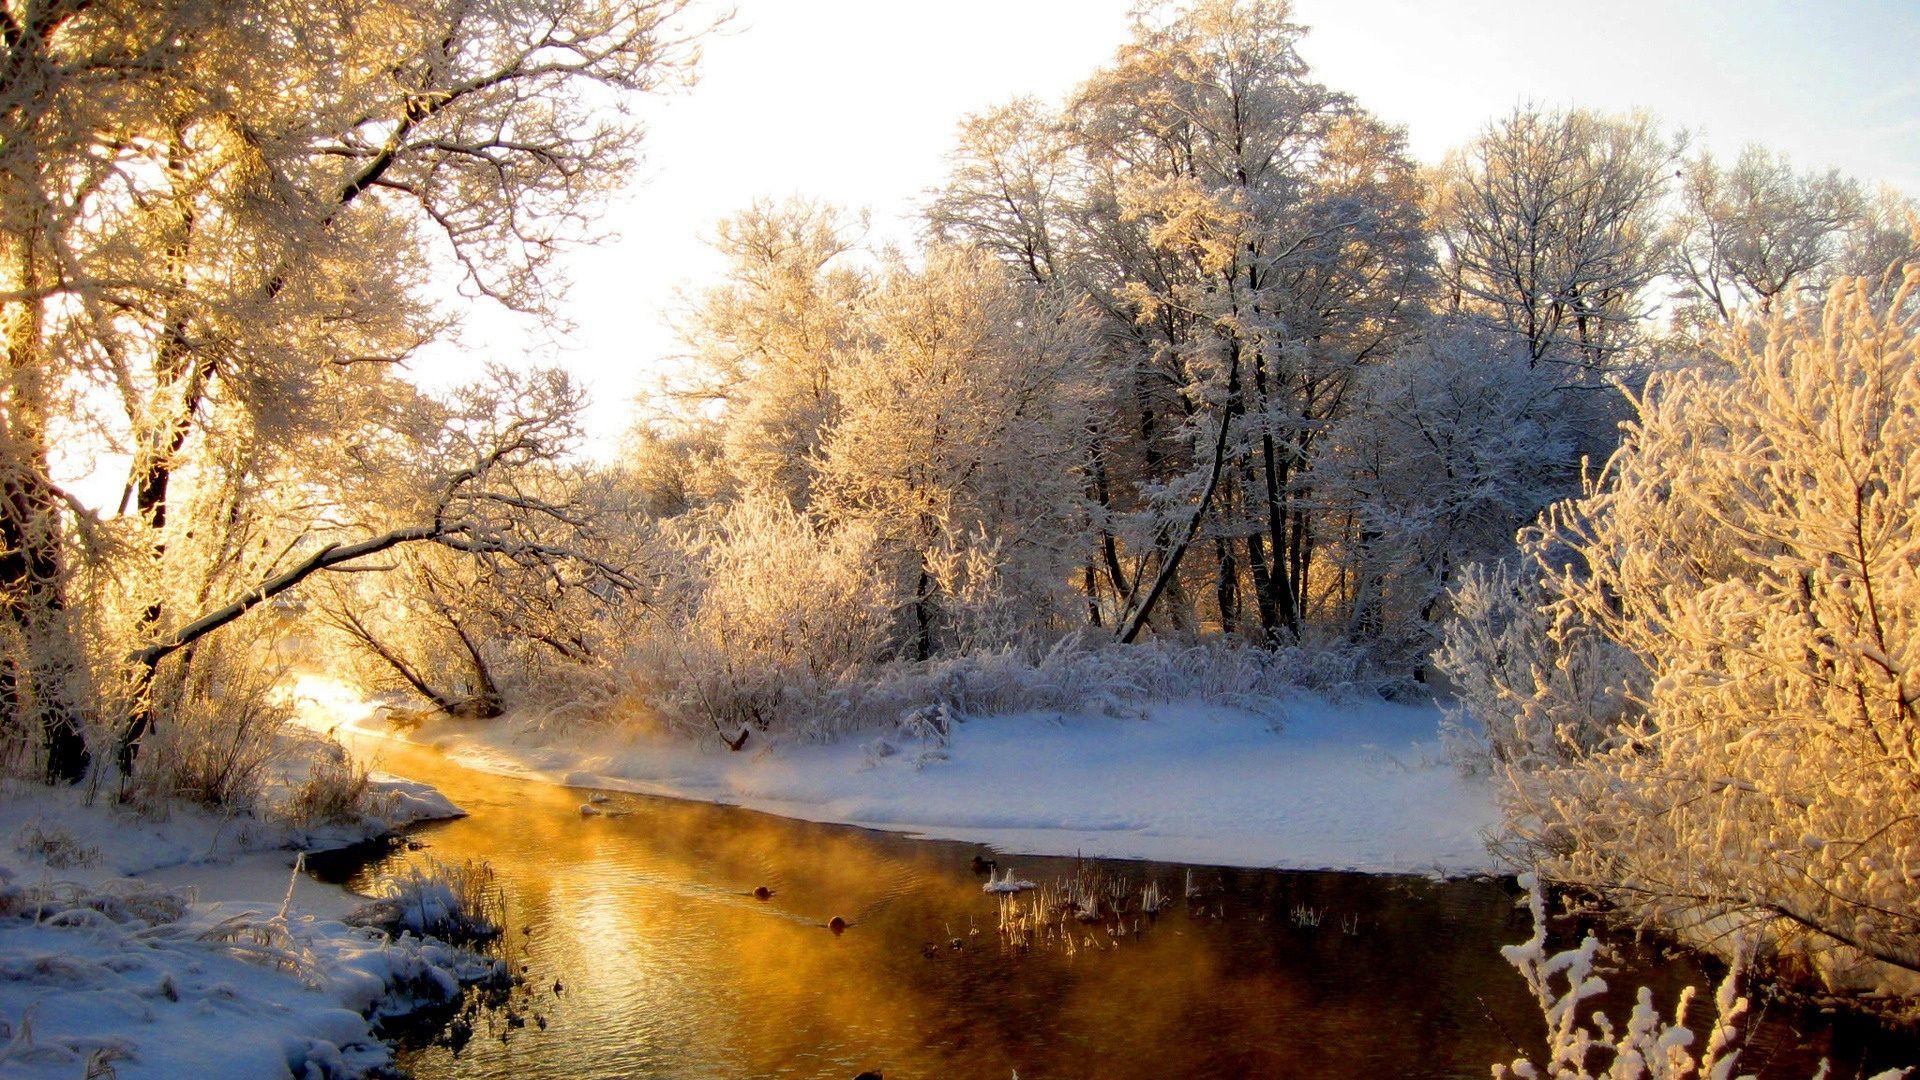 winter nature wallpaper #11373 wallpaper | download hd wallpaper